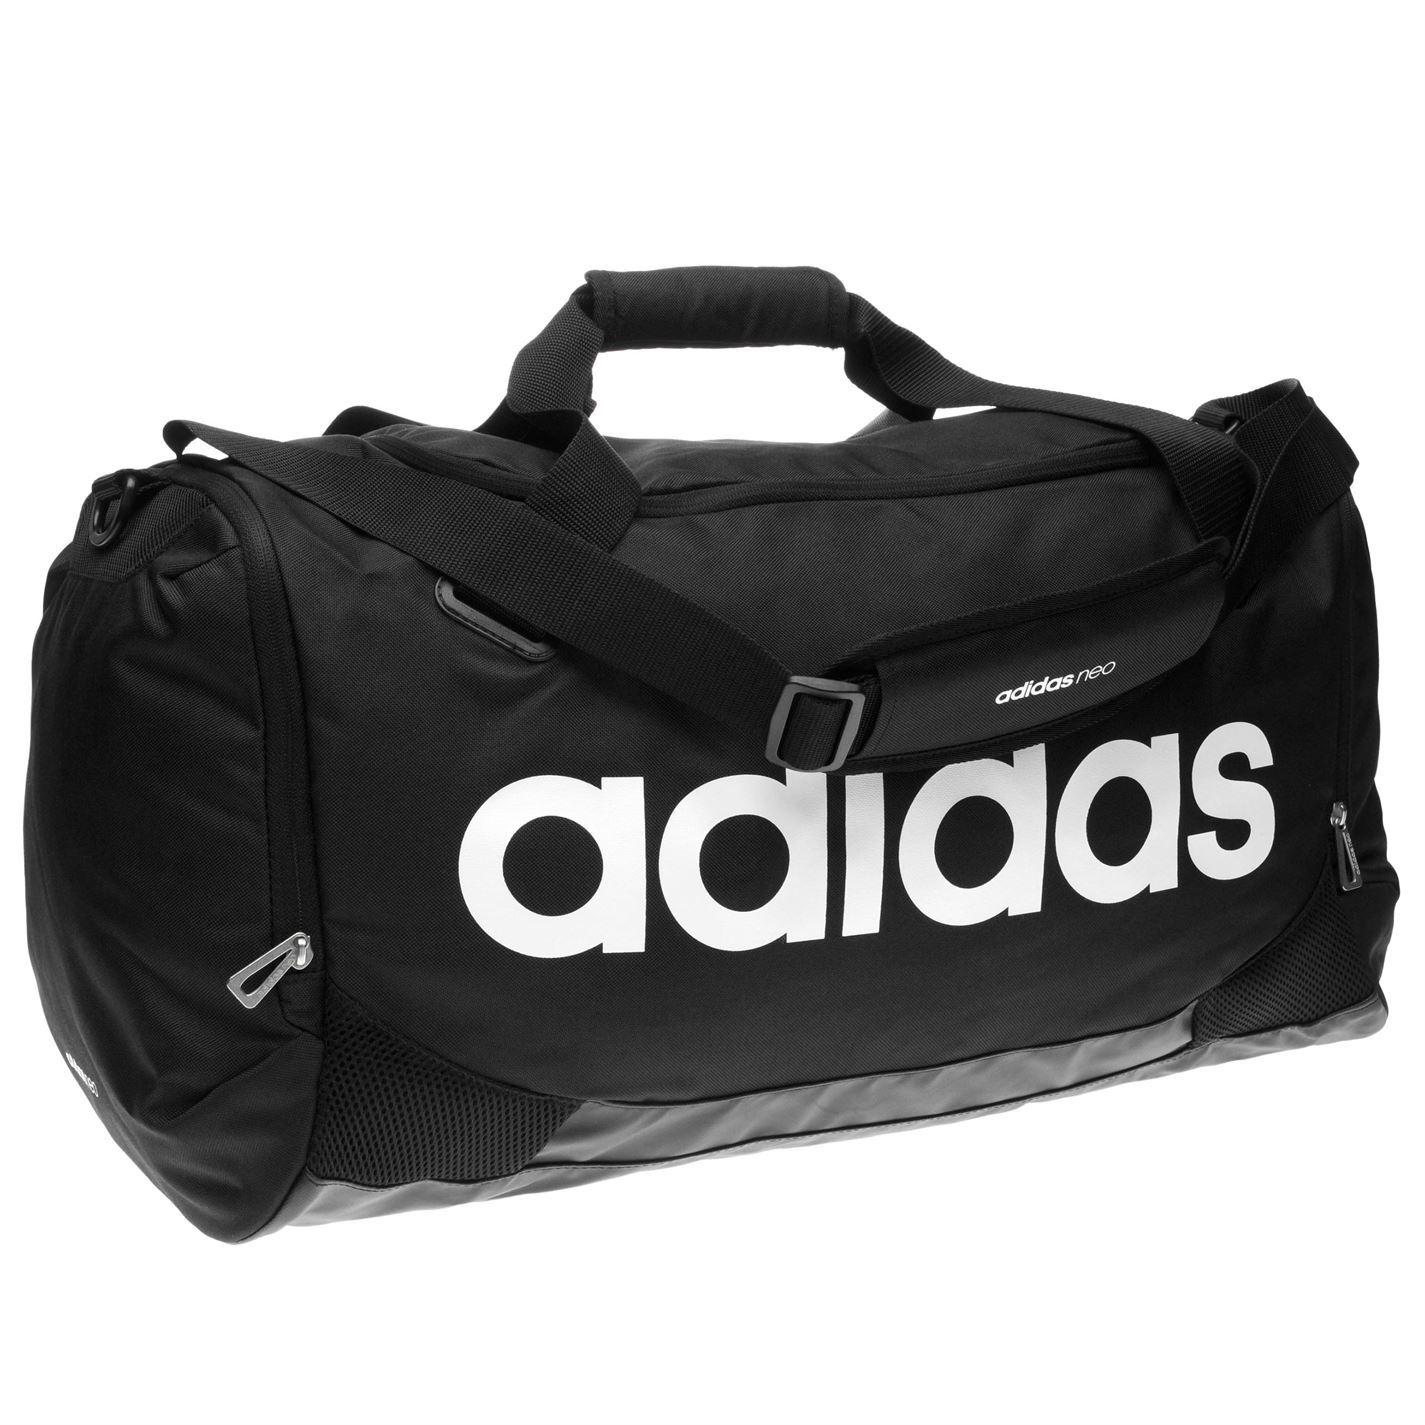 ... Adidas Linear Team Bag Medium Black Sports Gymbag Kitbag ... fc6e7695b1279